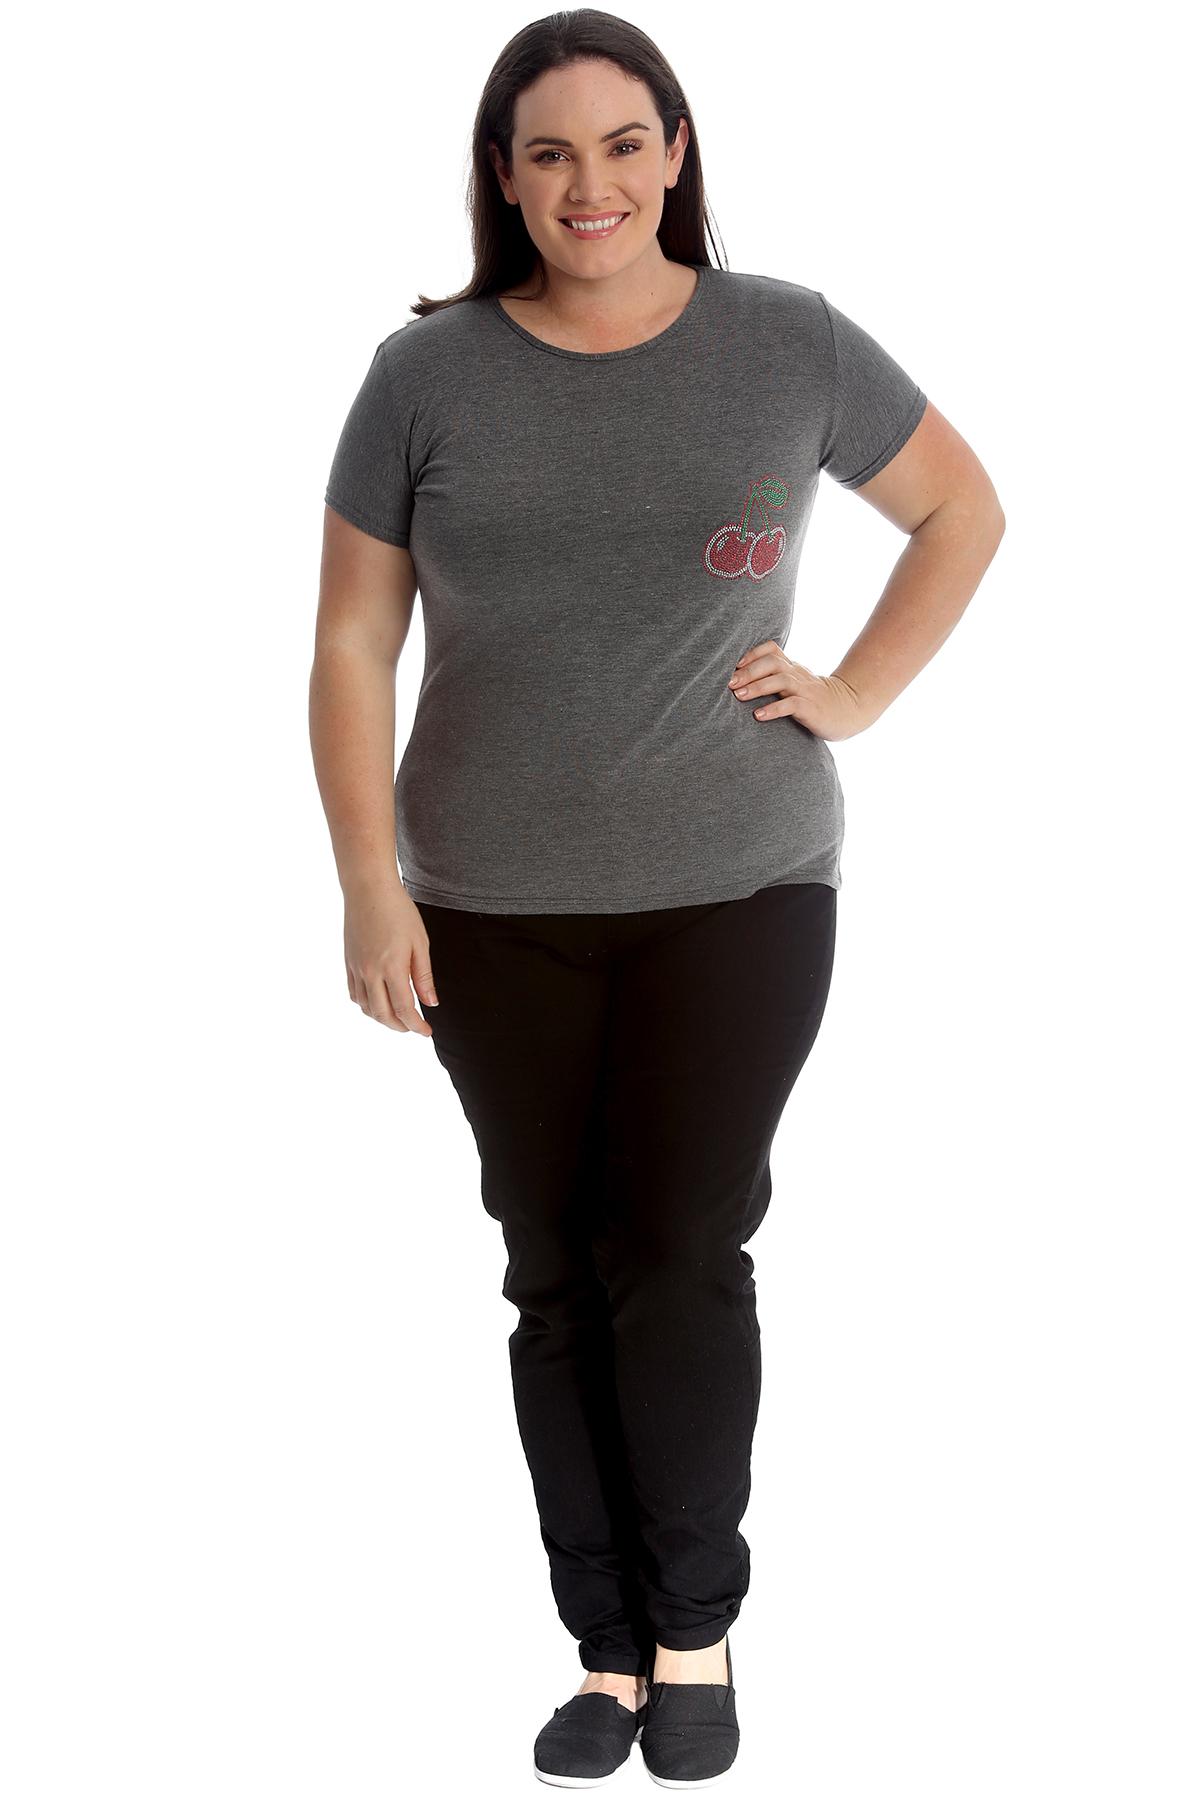 New-Womens-Plus-Size-Top-Ladies-Cherry-Rhinestone-T-Shirt-Soft-Stud-Shiny-Hip thumbnail 25